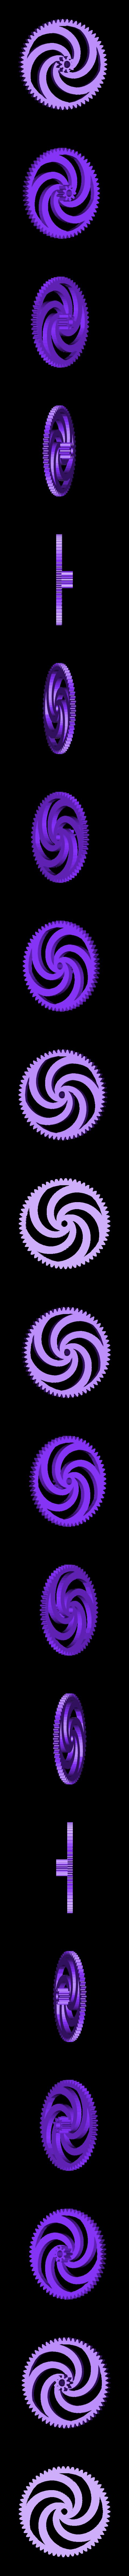 involute_blower_gear_idler.stl Download free STL file Involute Blower • 3D print design, Azagal